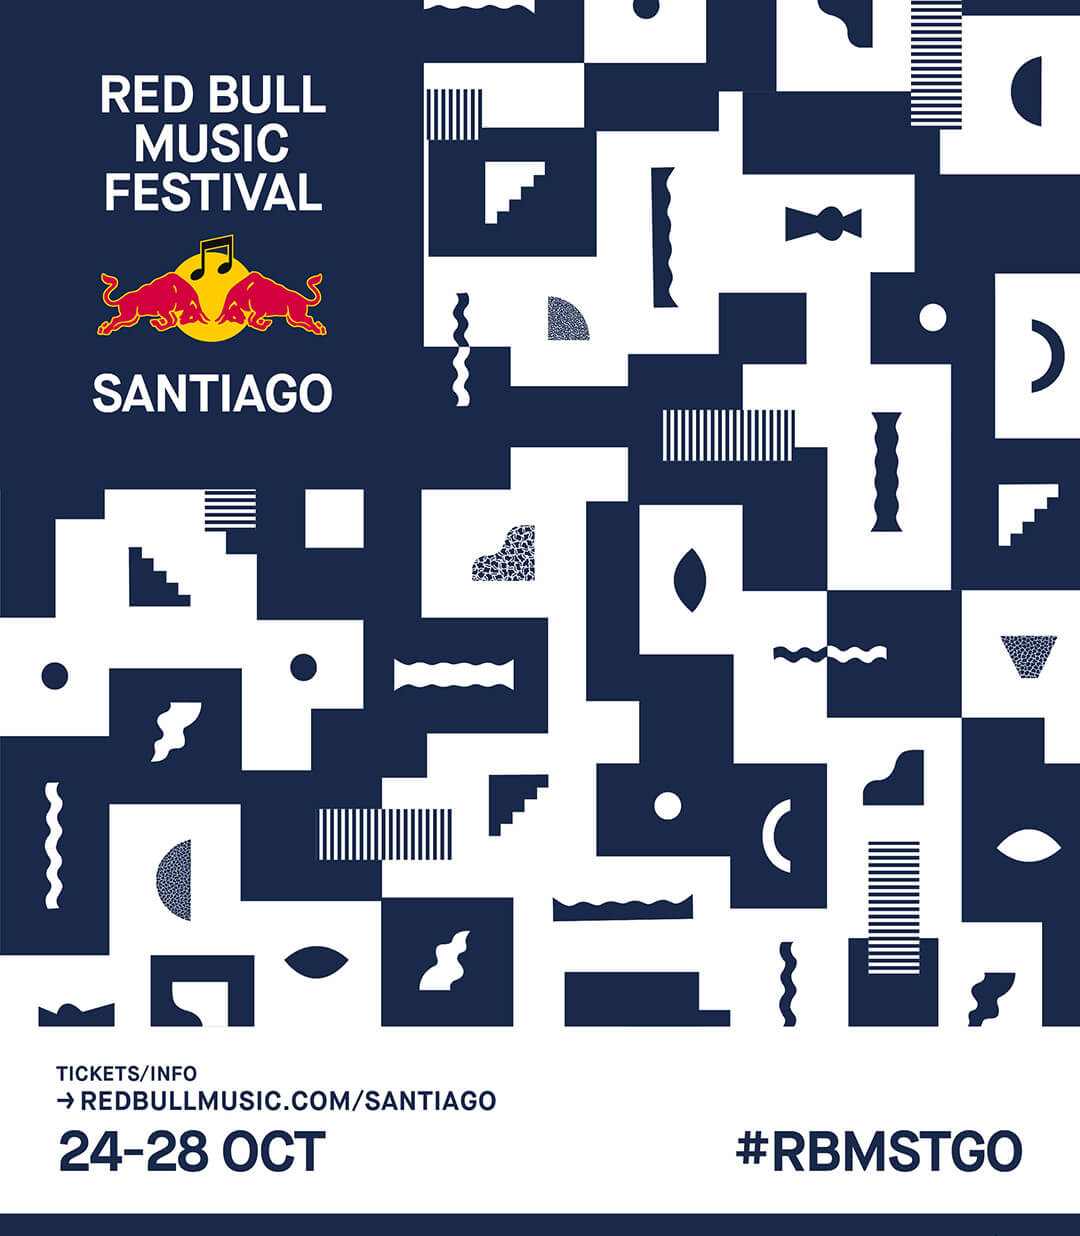 Lo que debes saber del Red Bull Music Festival Santiago 2018